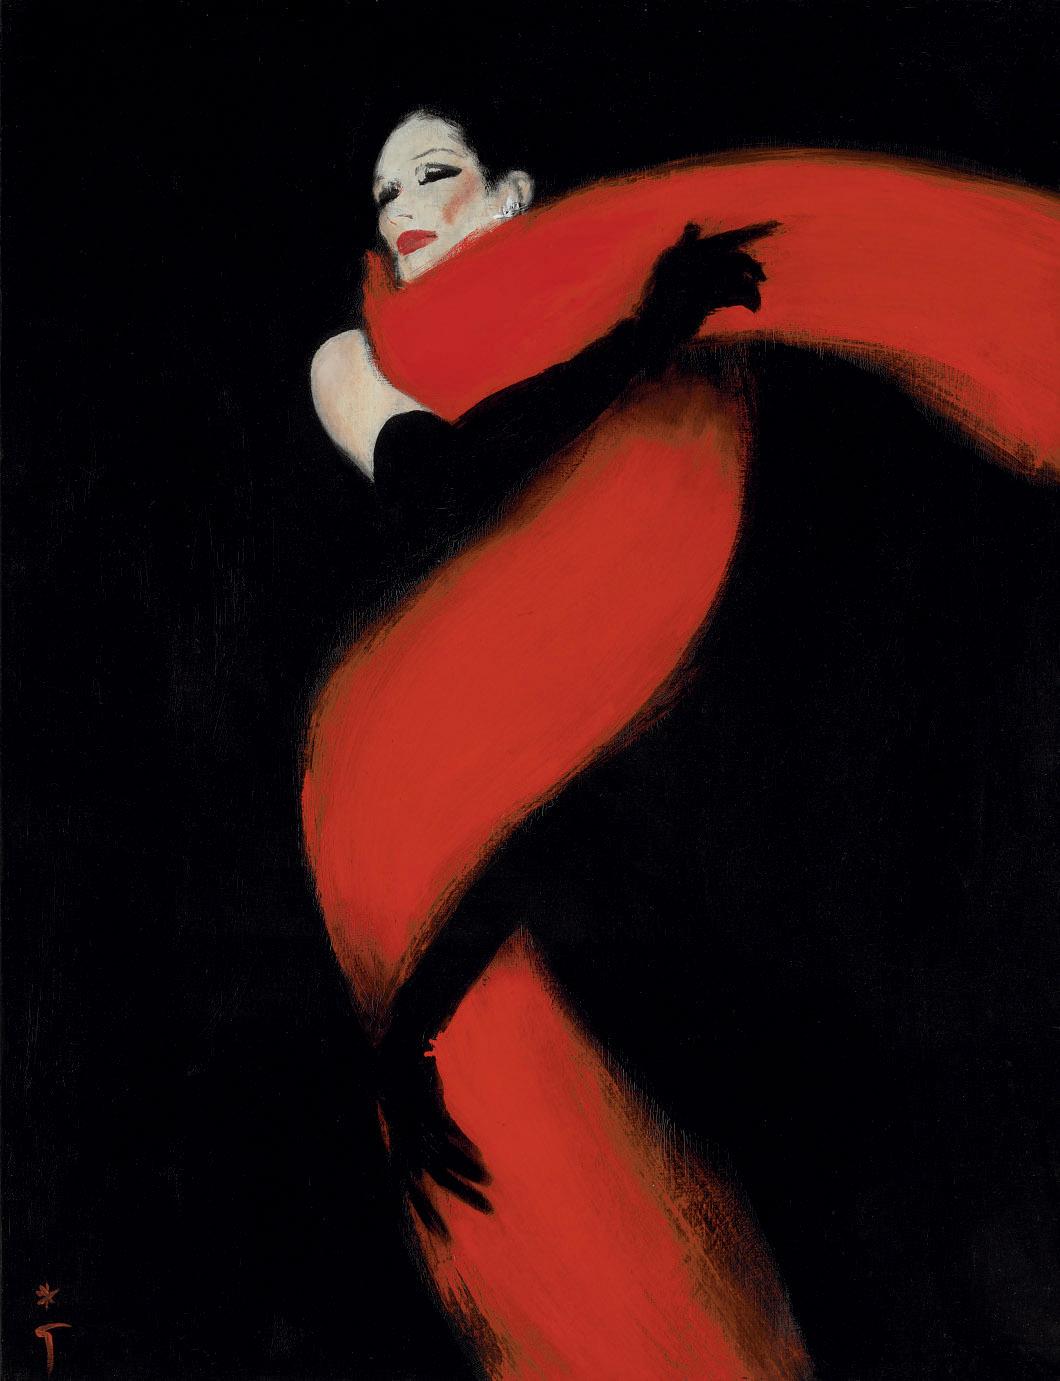 RENE GRUAU (1909-2004)